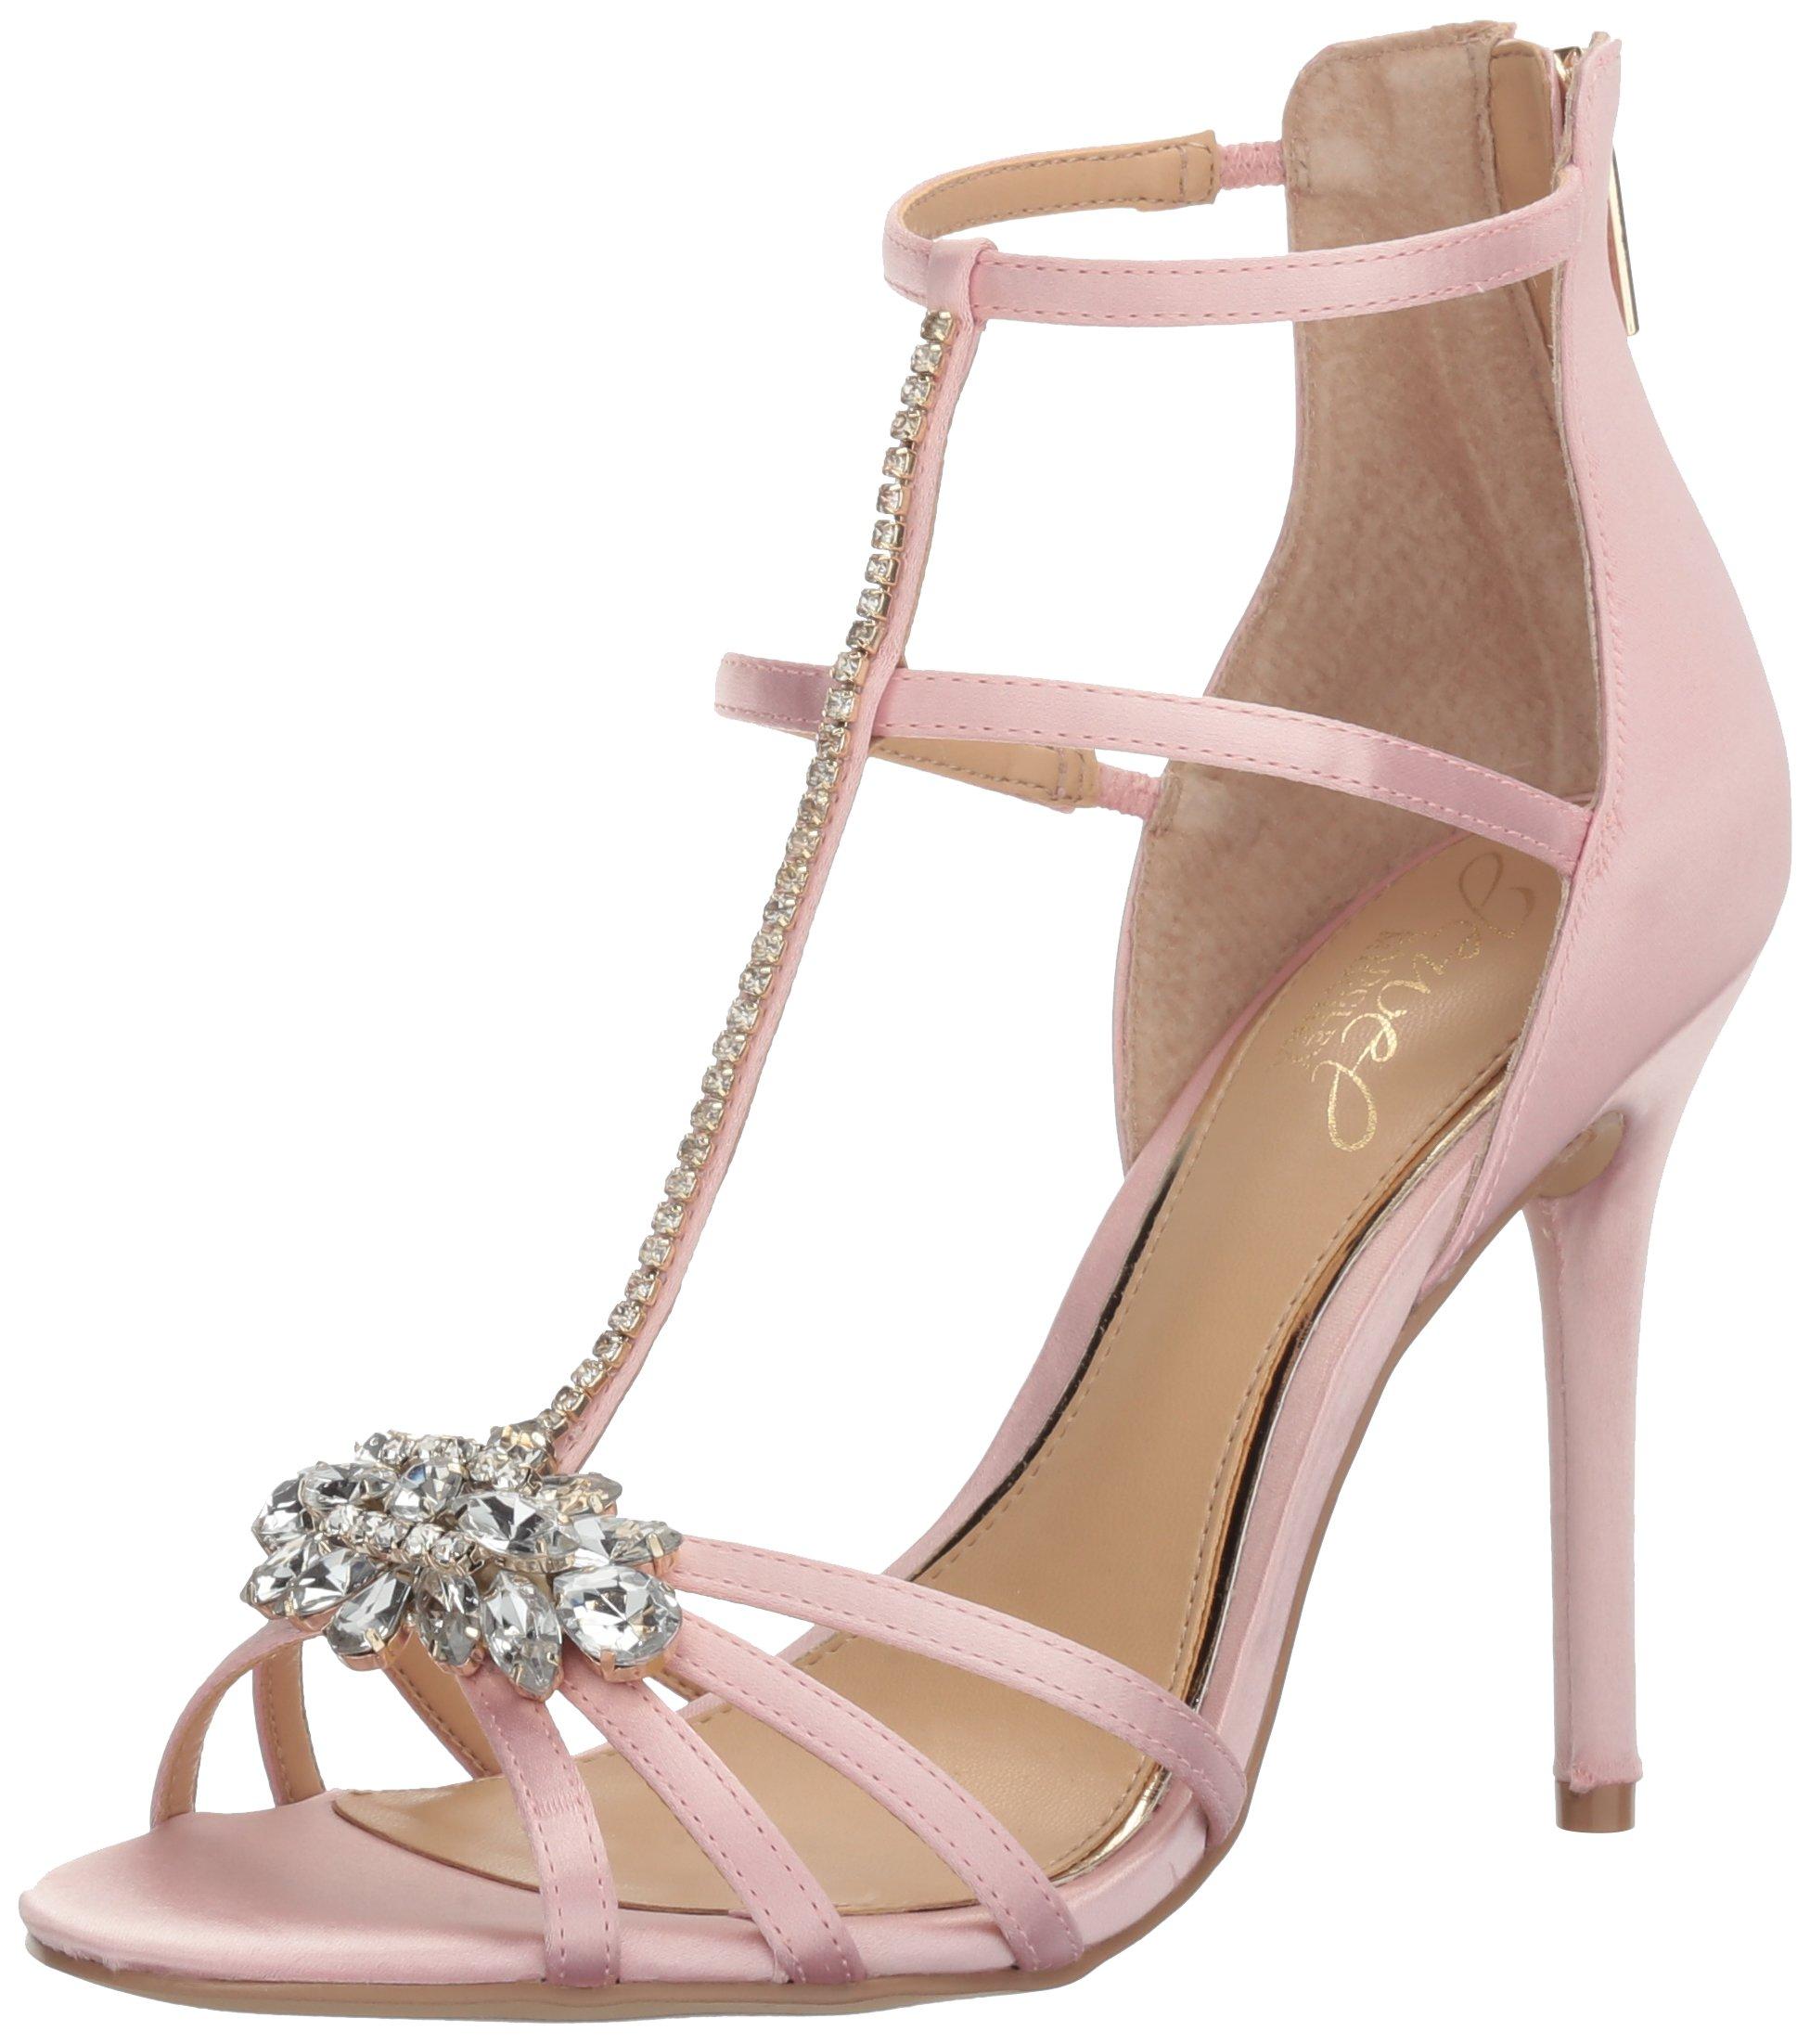 Jewel Badgley Mischka Women's Hazel Dress Sandal, Pale Pink, 6 M US